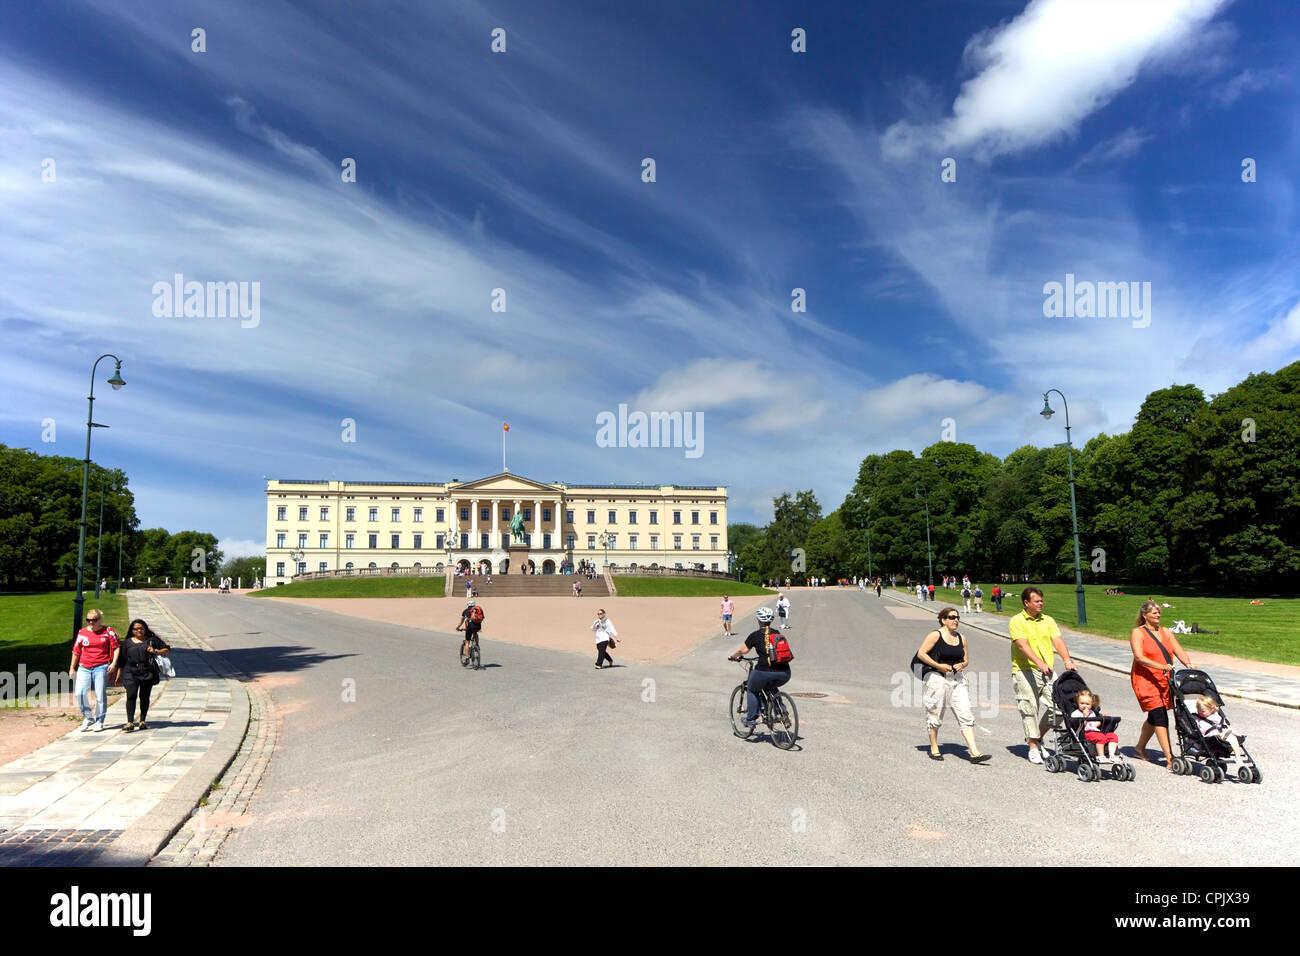 Slottet Royal Palace exterior, from Karl Johans Gate, Oslo, Norway, Scandinavia, Europe - Stock Image